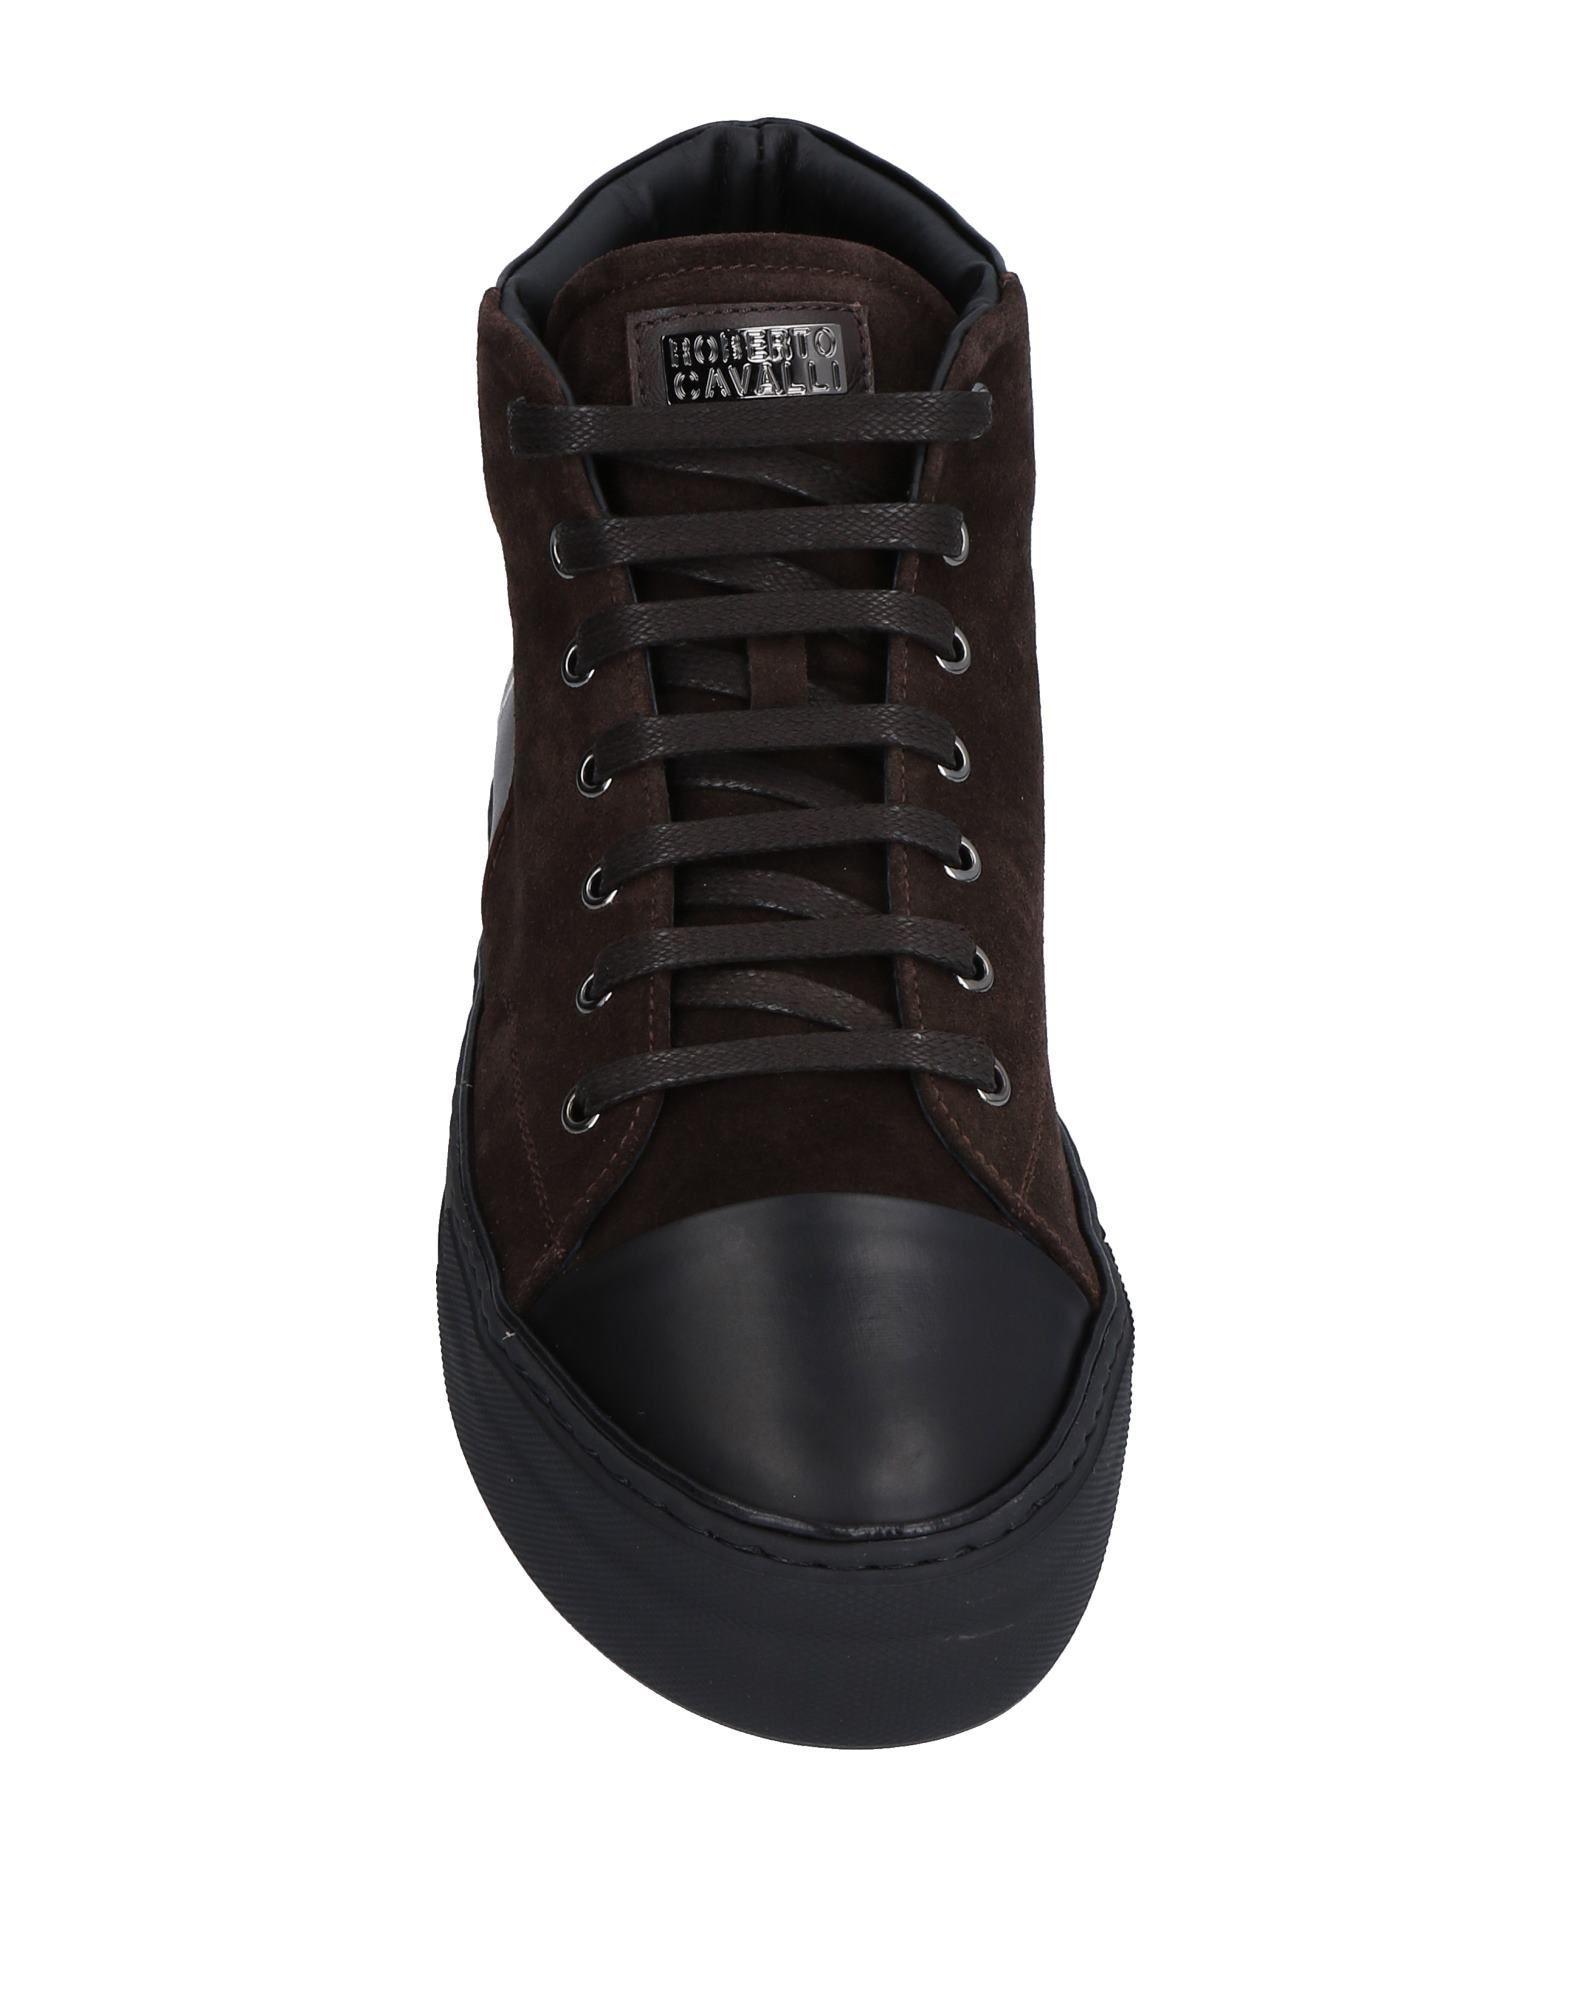 Roberto Cavalli Dark Brown Leather Sneakers